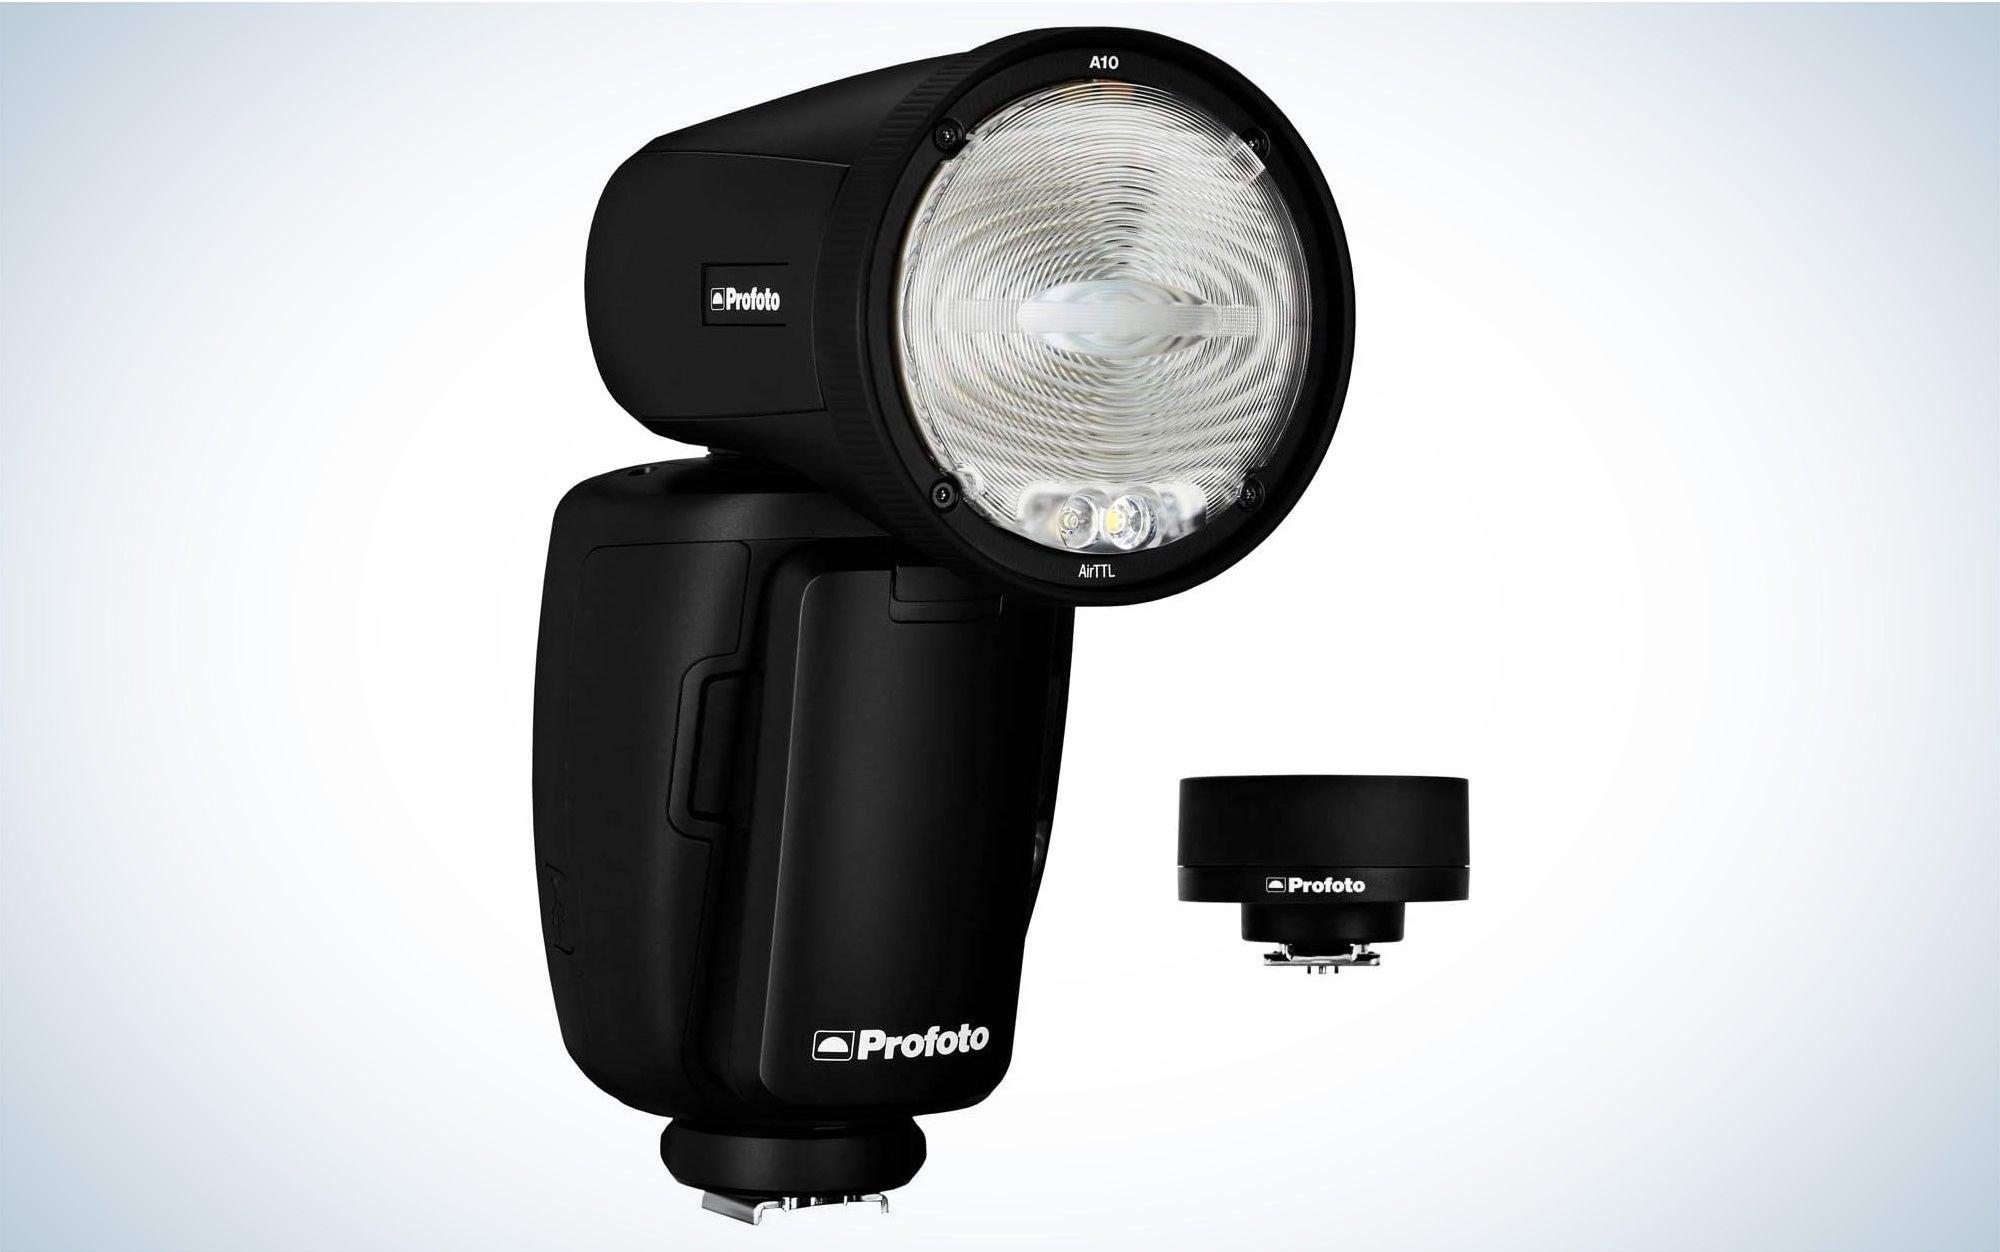 Profoto A10 On/Off detachable Camera Flash Kit